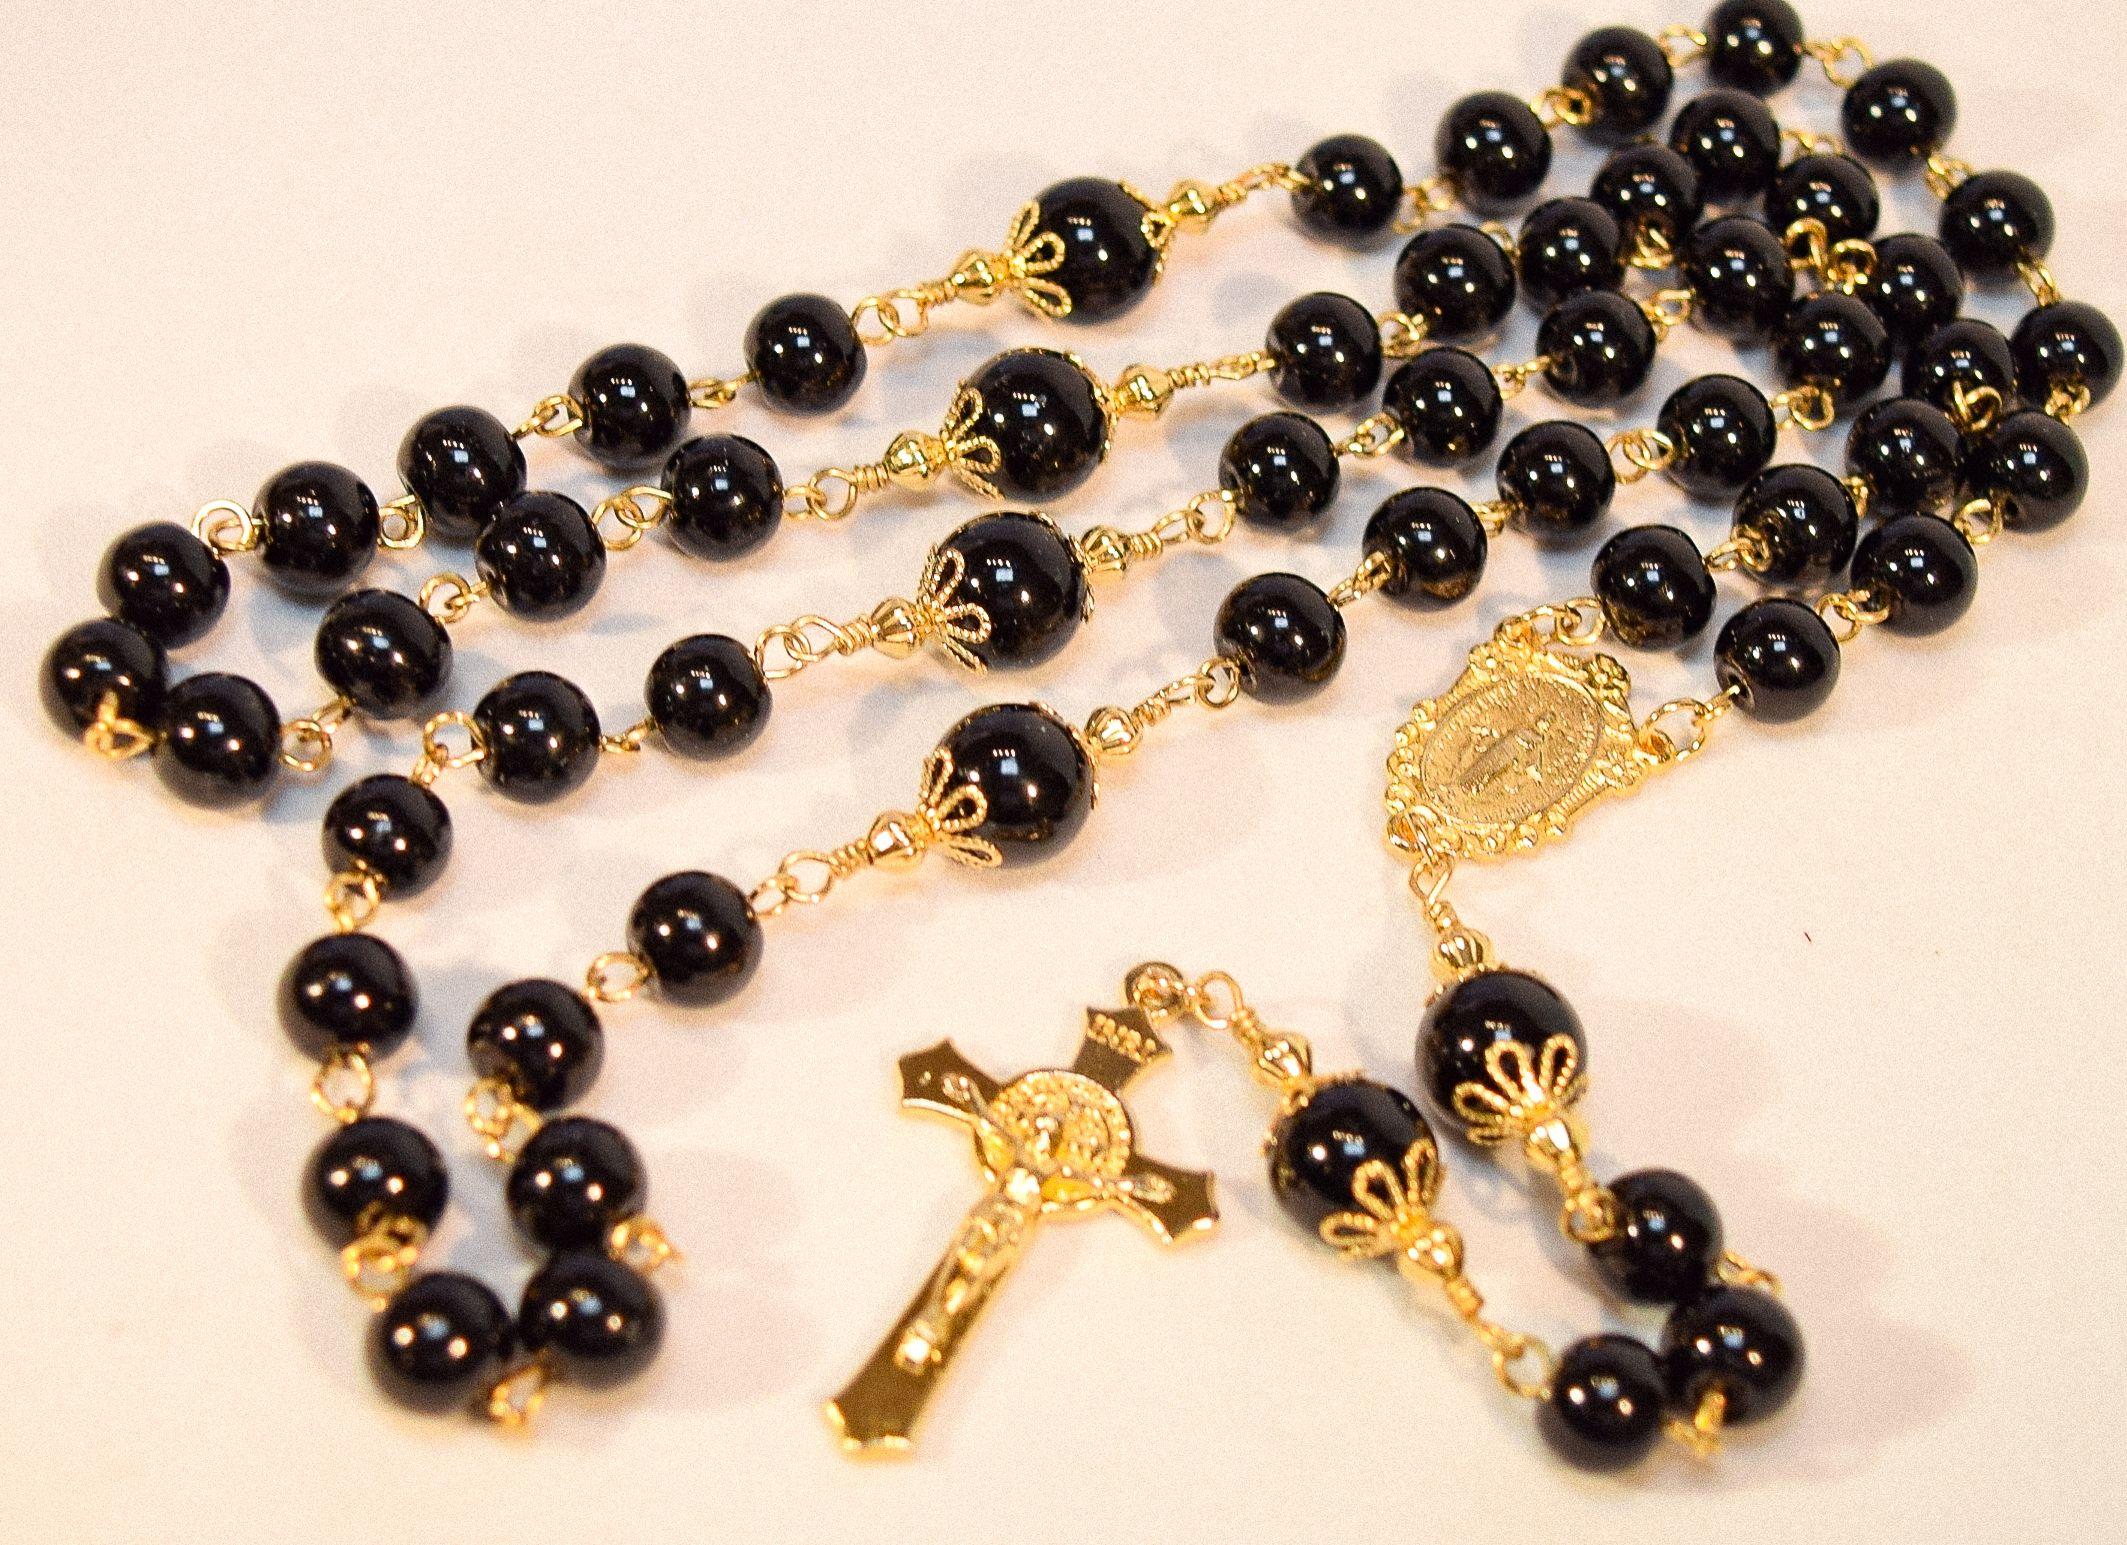 Onyx Rosary with Italian made Crucifix